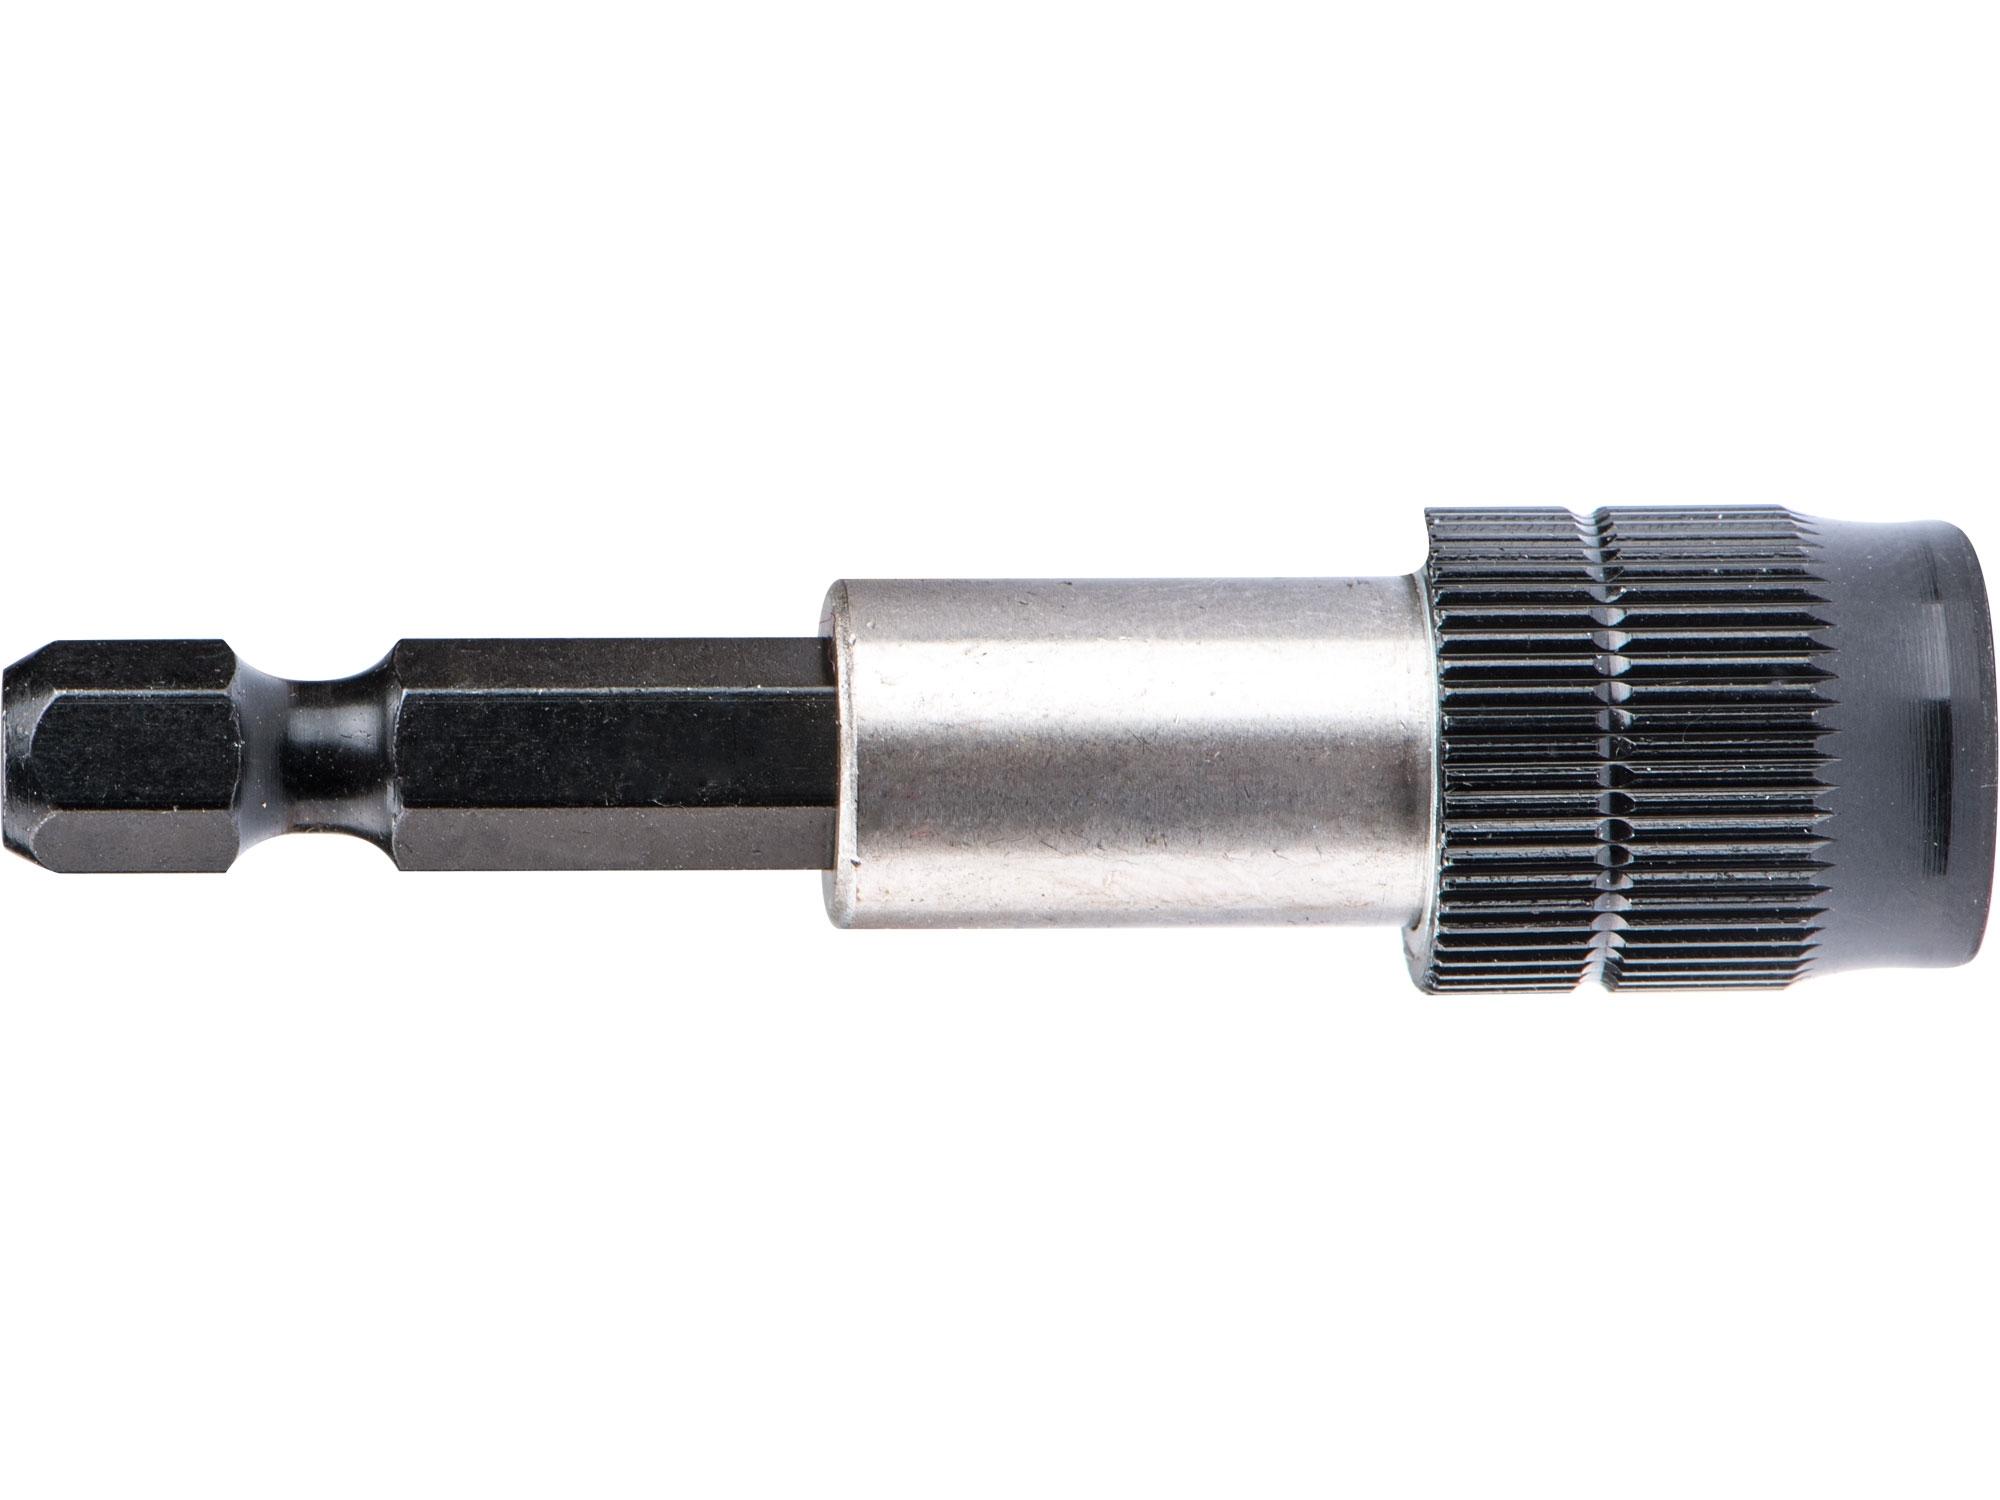 "držák hrotů do vrtačky, 1/4""x60mm, Fix-Clip, CrV"